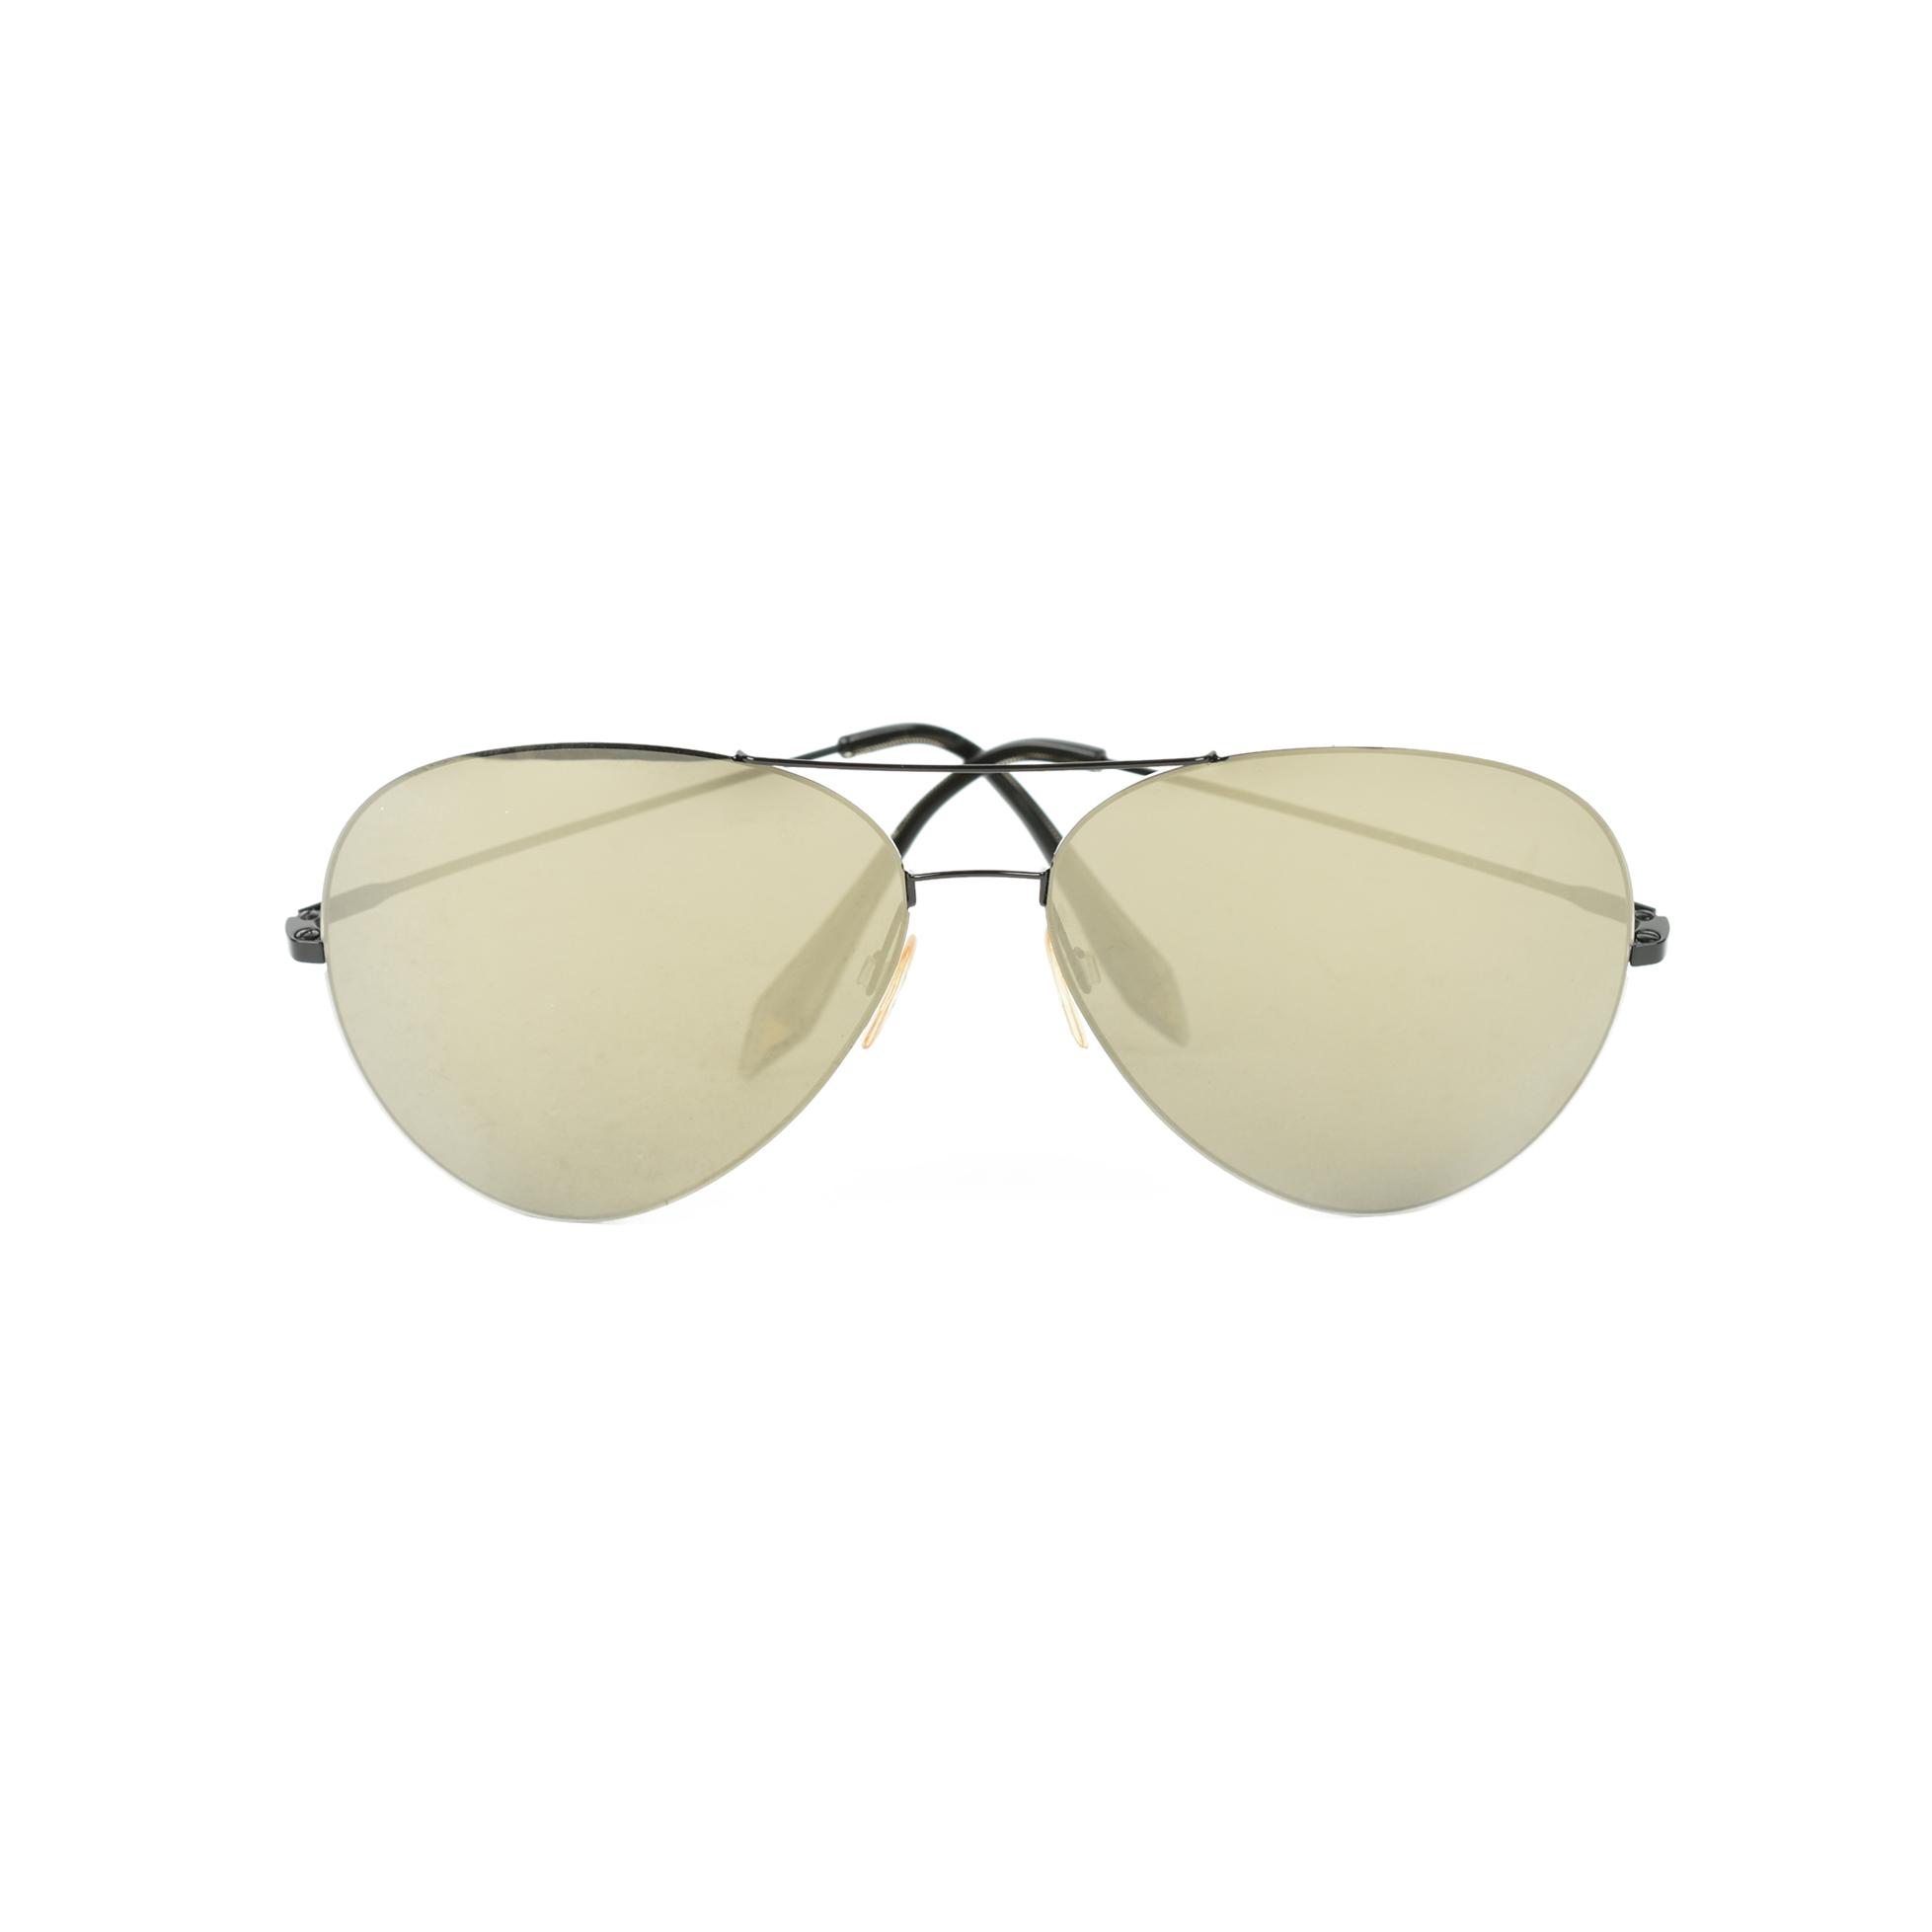 24d887b01b Victoria Beckham Sunglasses Gold – Southern California Weather Force